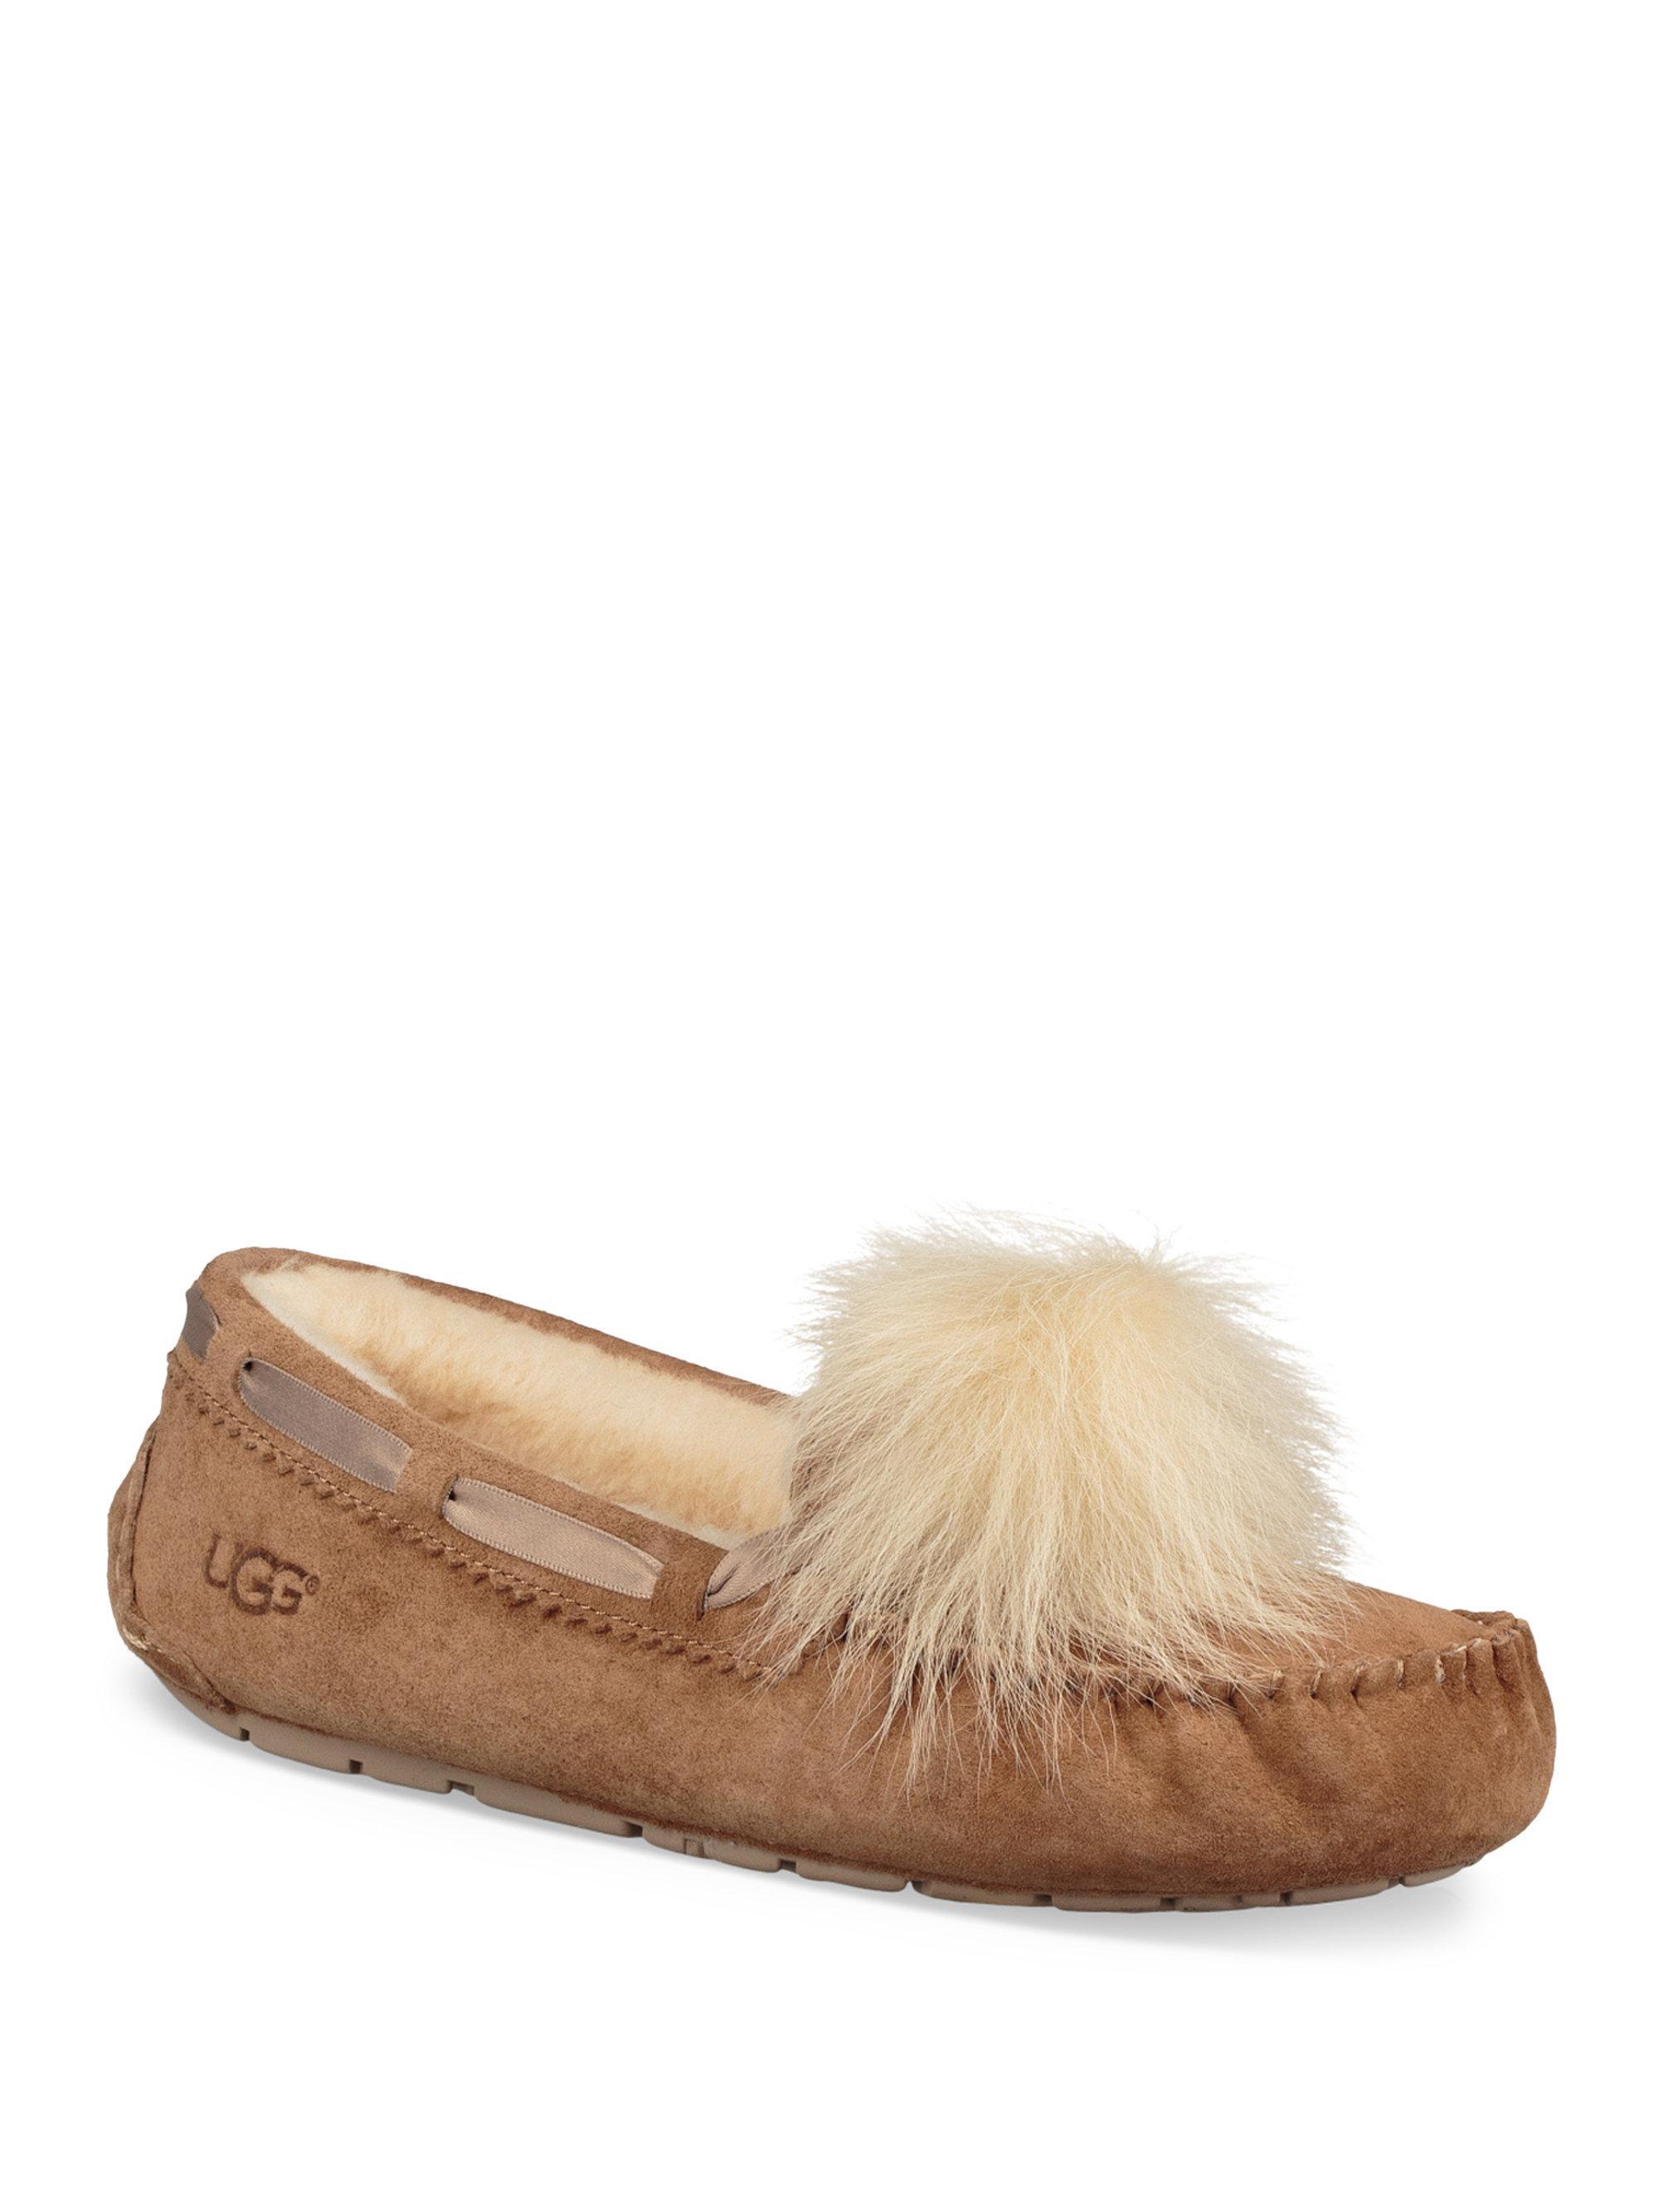 Ugg Dakota Fur Pom Pom Suede Loafers In Chestnut Brown